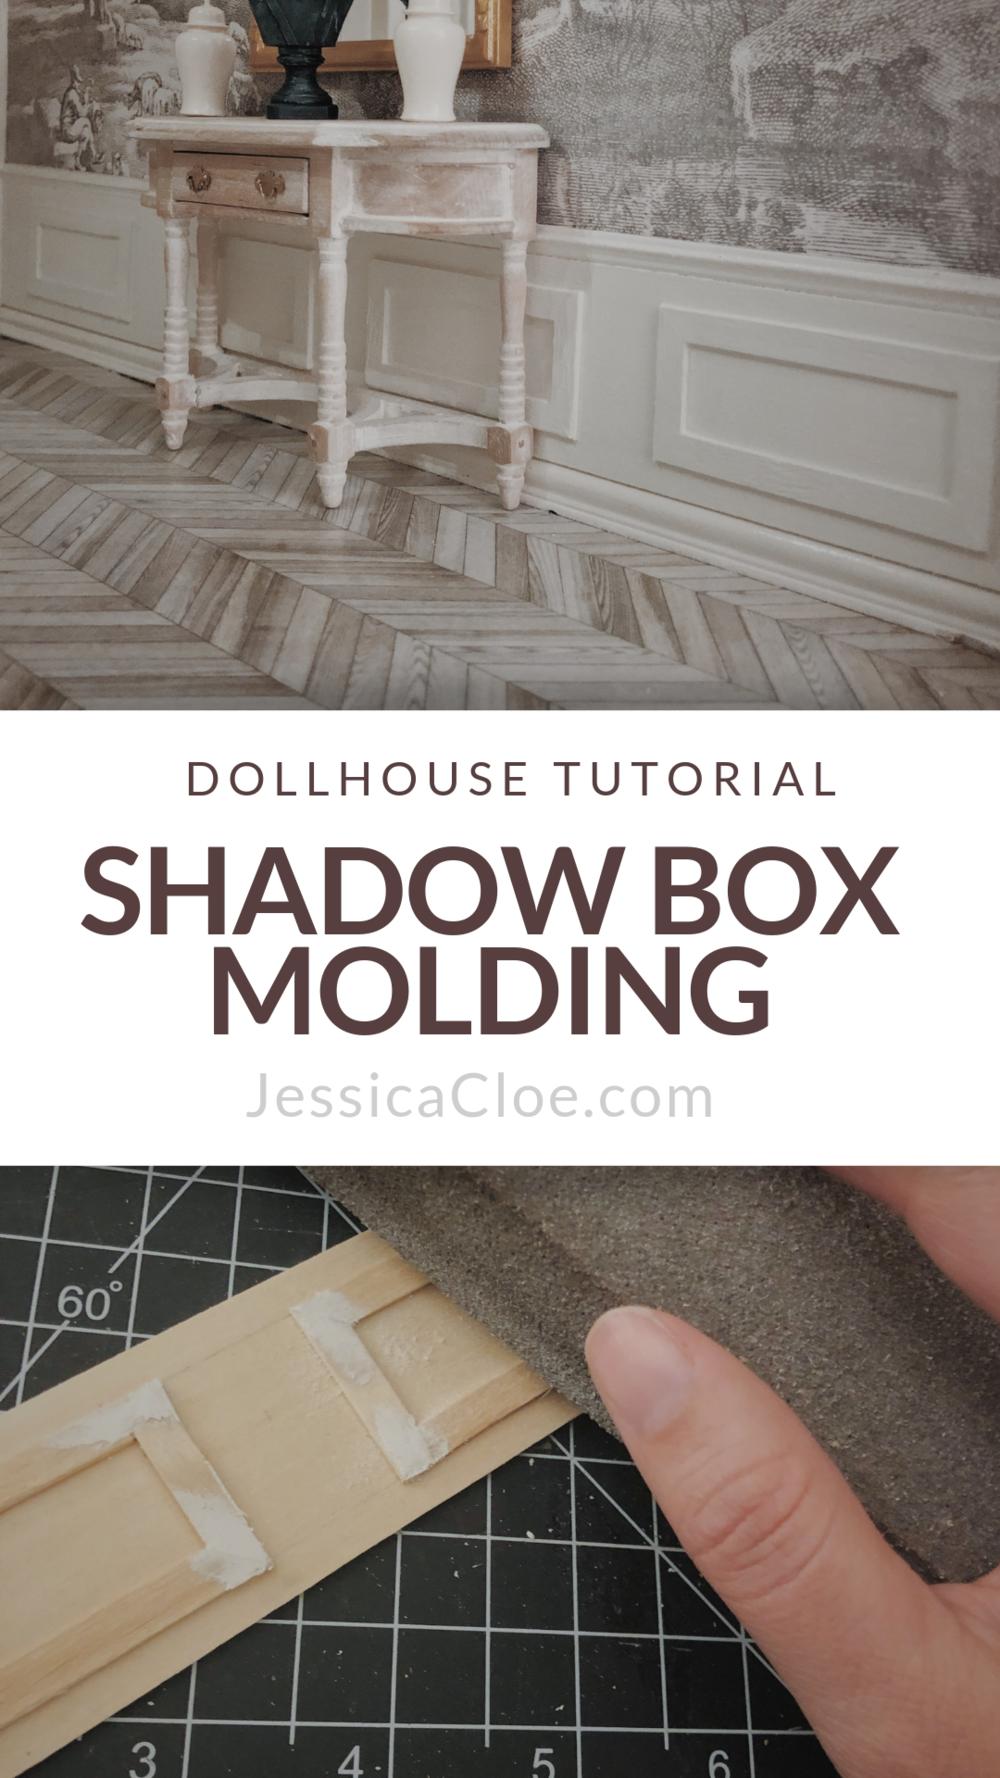 Shadow Box Molding — Jessica Cloe Miniatures